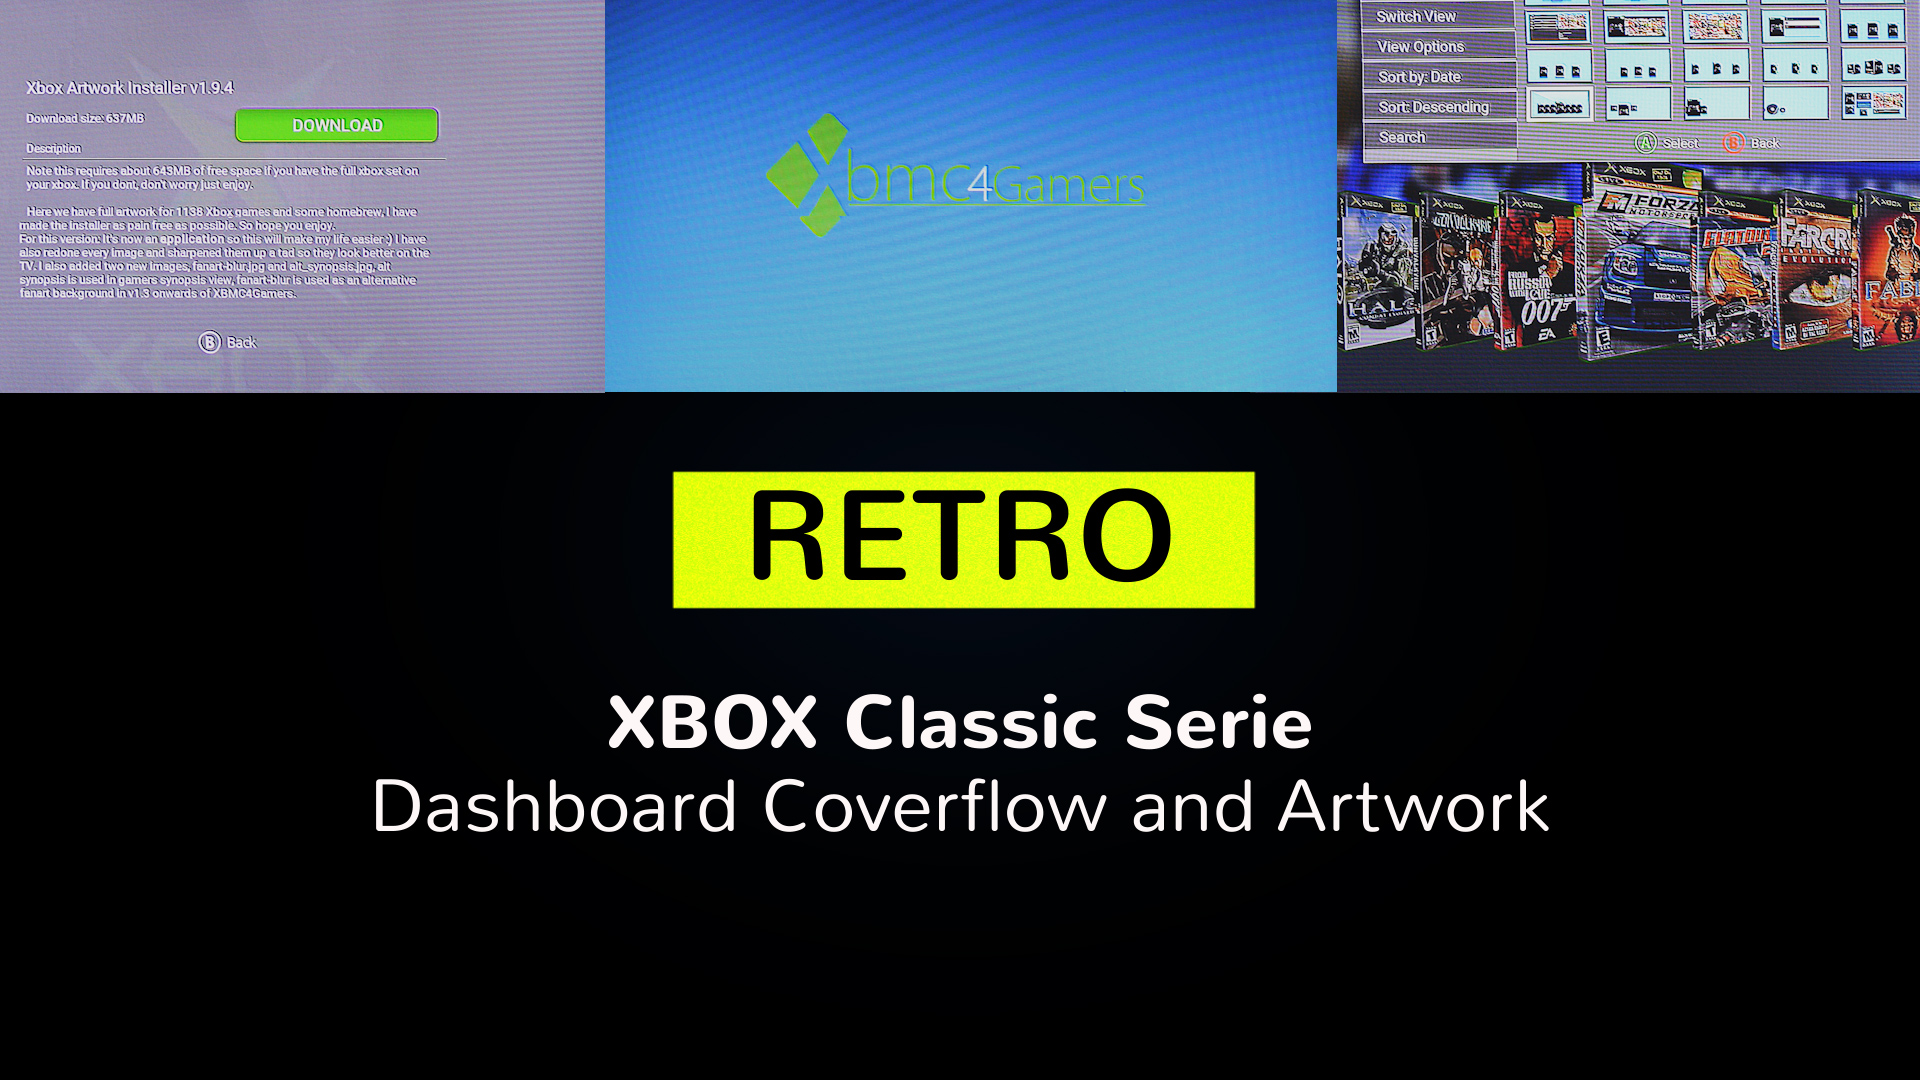 XBOX Classic Serie - XMBC Dashboard coverflow artwork nutzen